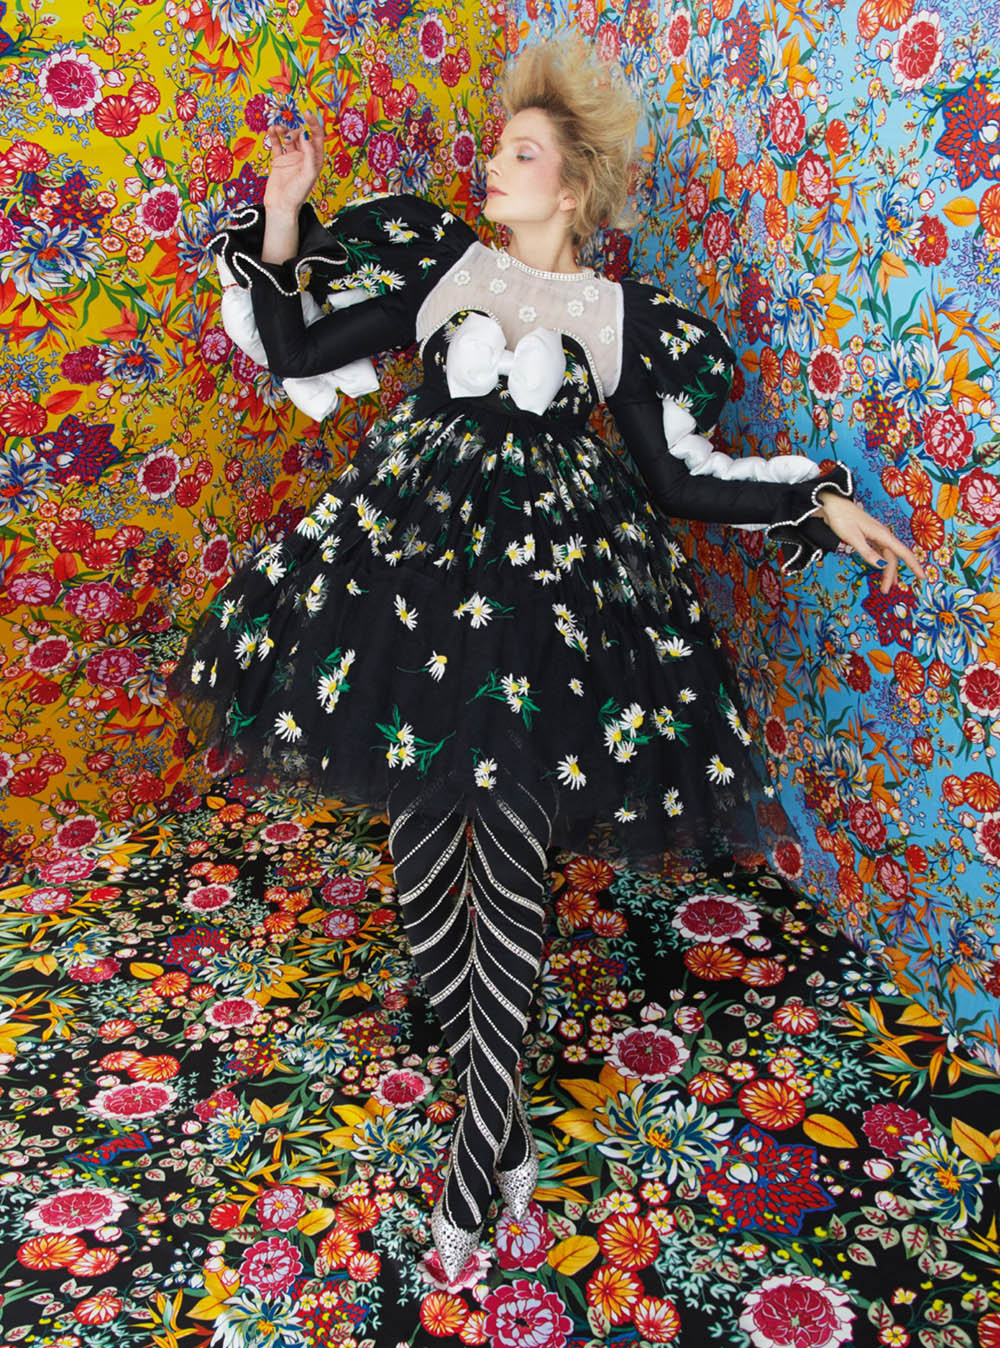 Eniko Mihalik and Kim Noorda by Erik Madigan Heck for Harper's Bazaar UK May 2020